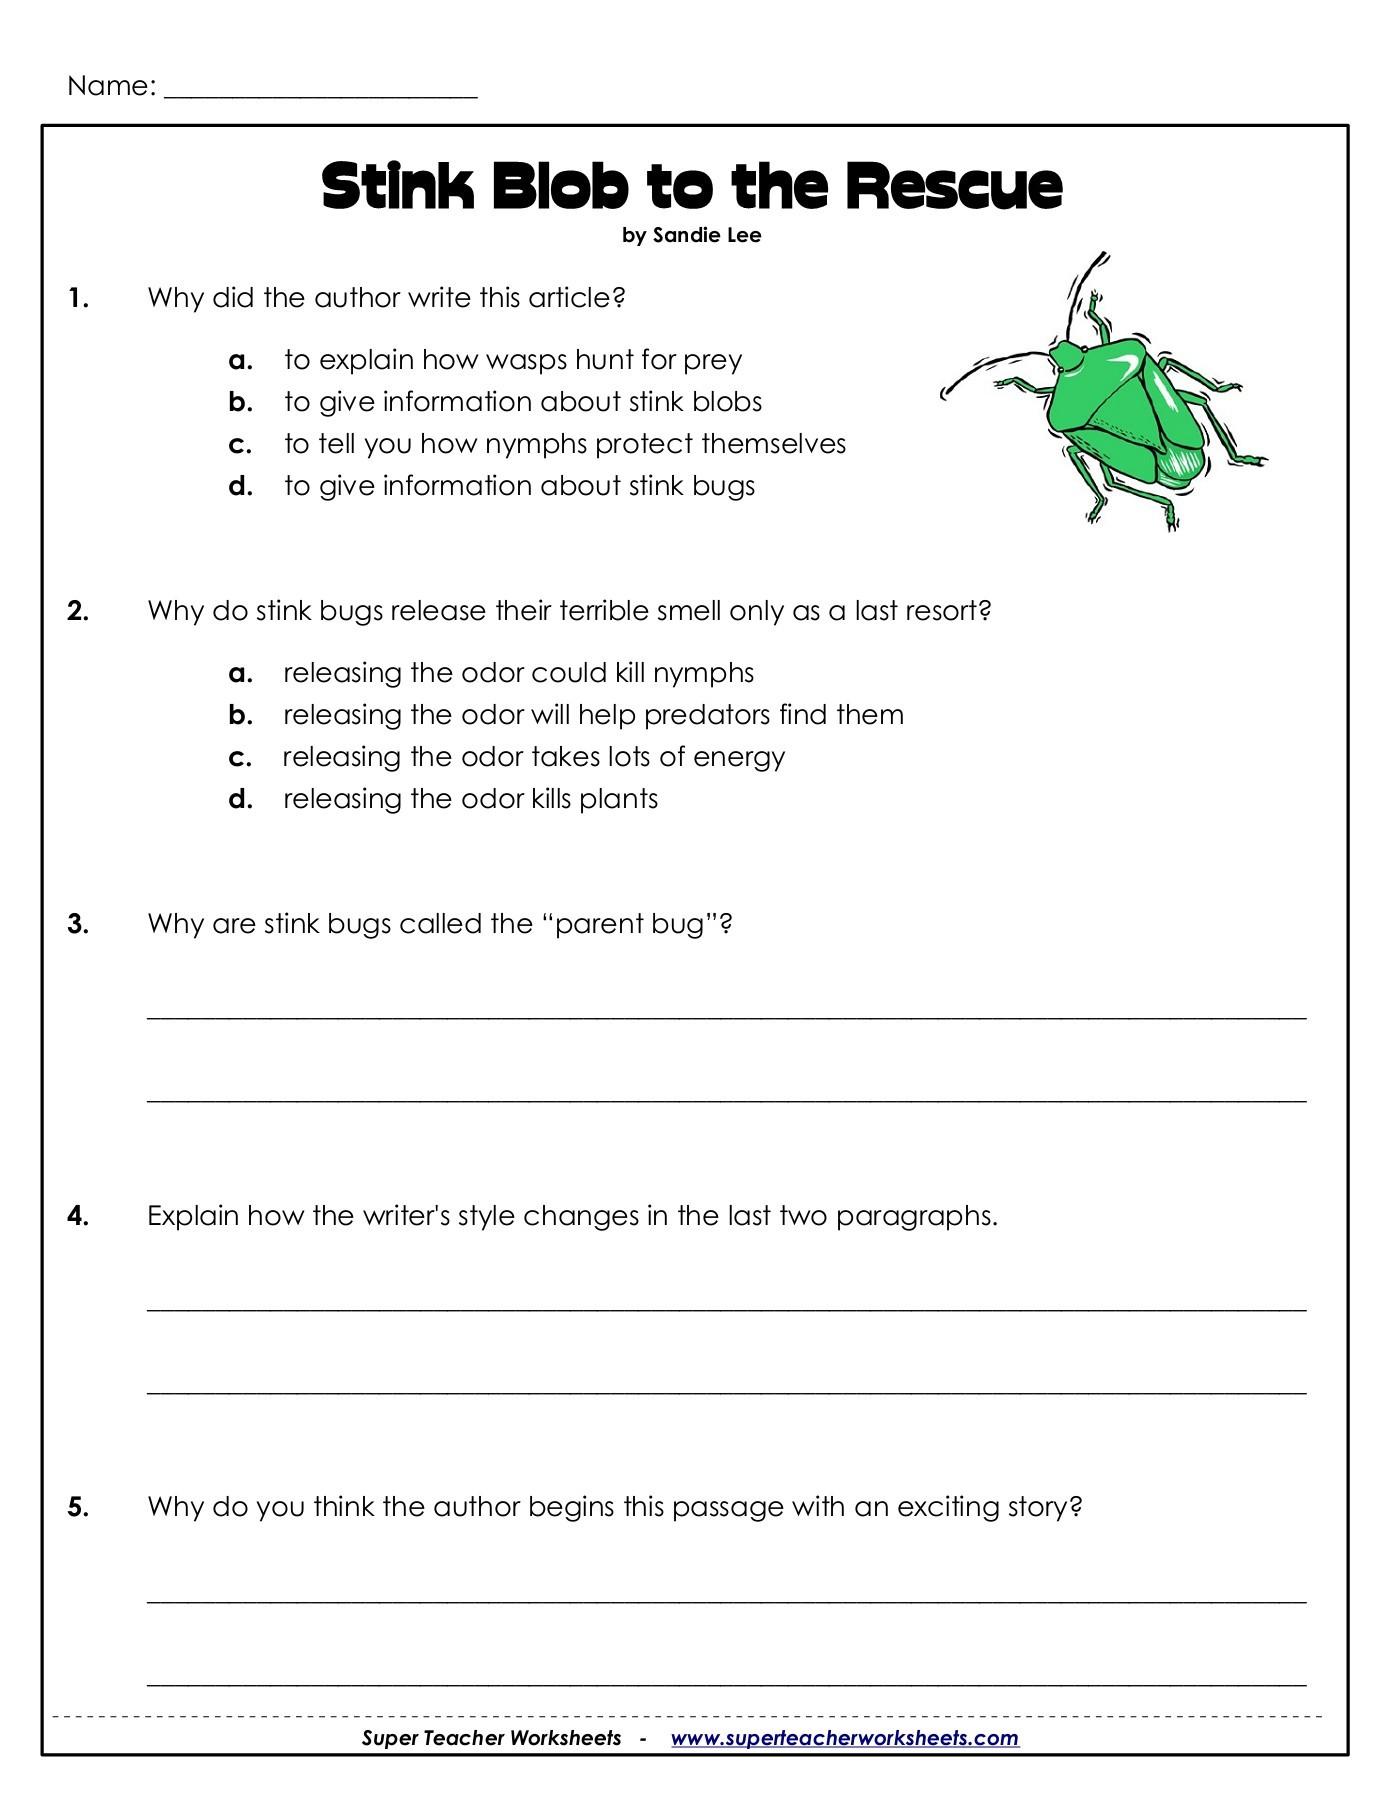 Super Teachers Worksheets Com